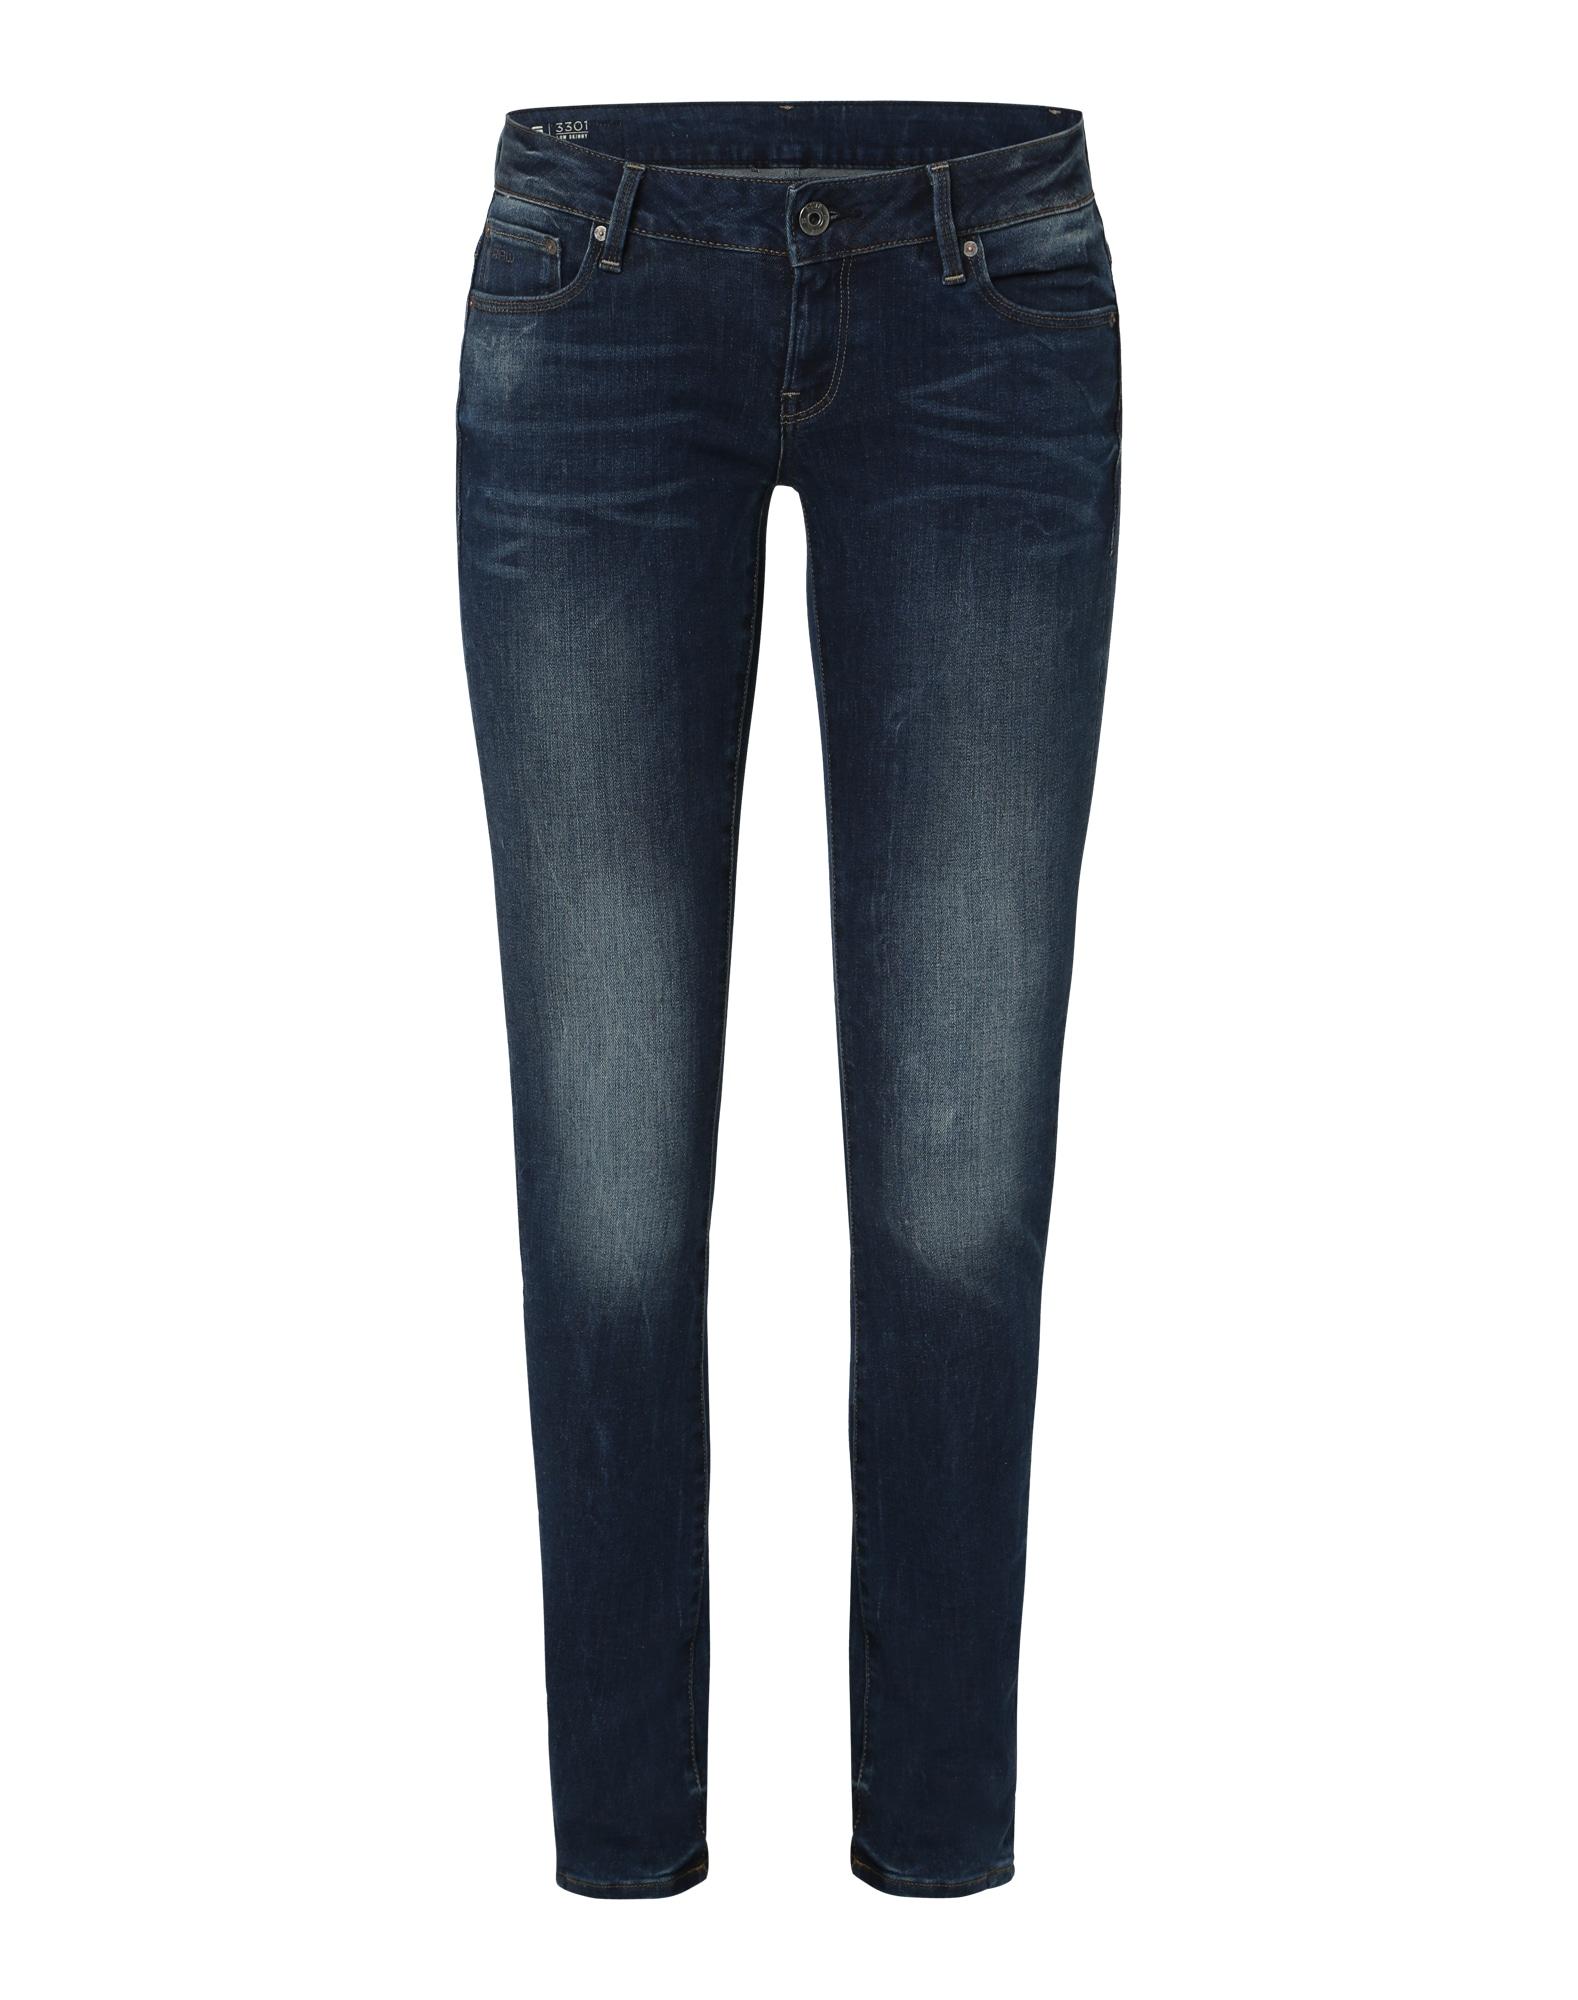 G-STAR RAW Dames Jeans 3301 Low Waist blue denim